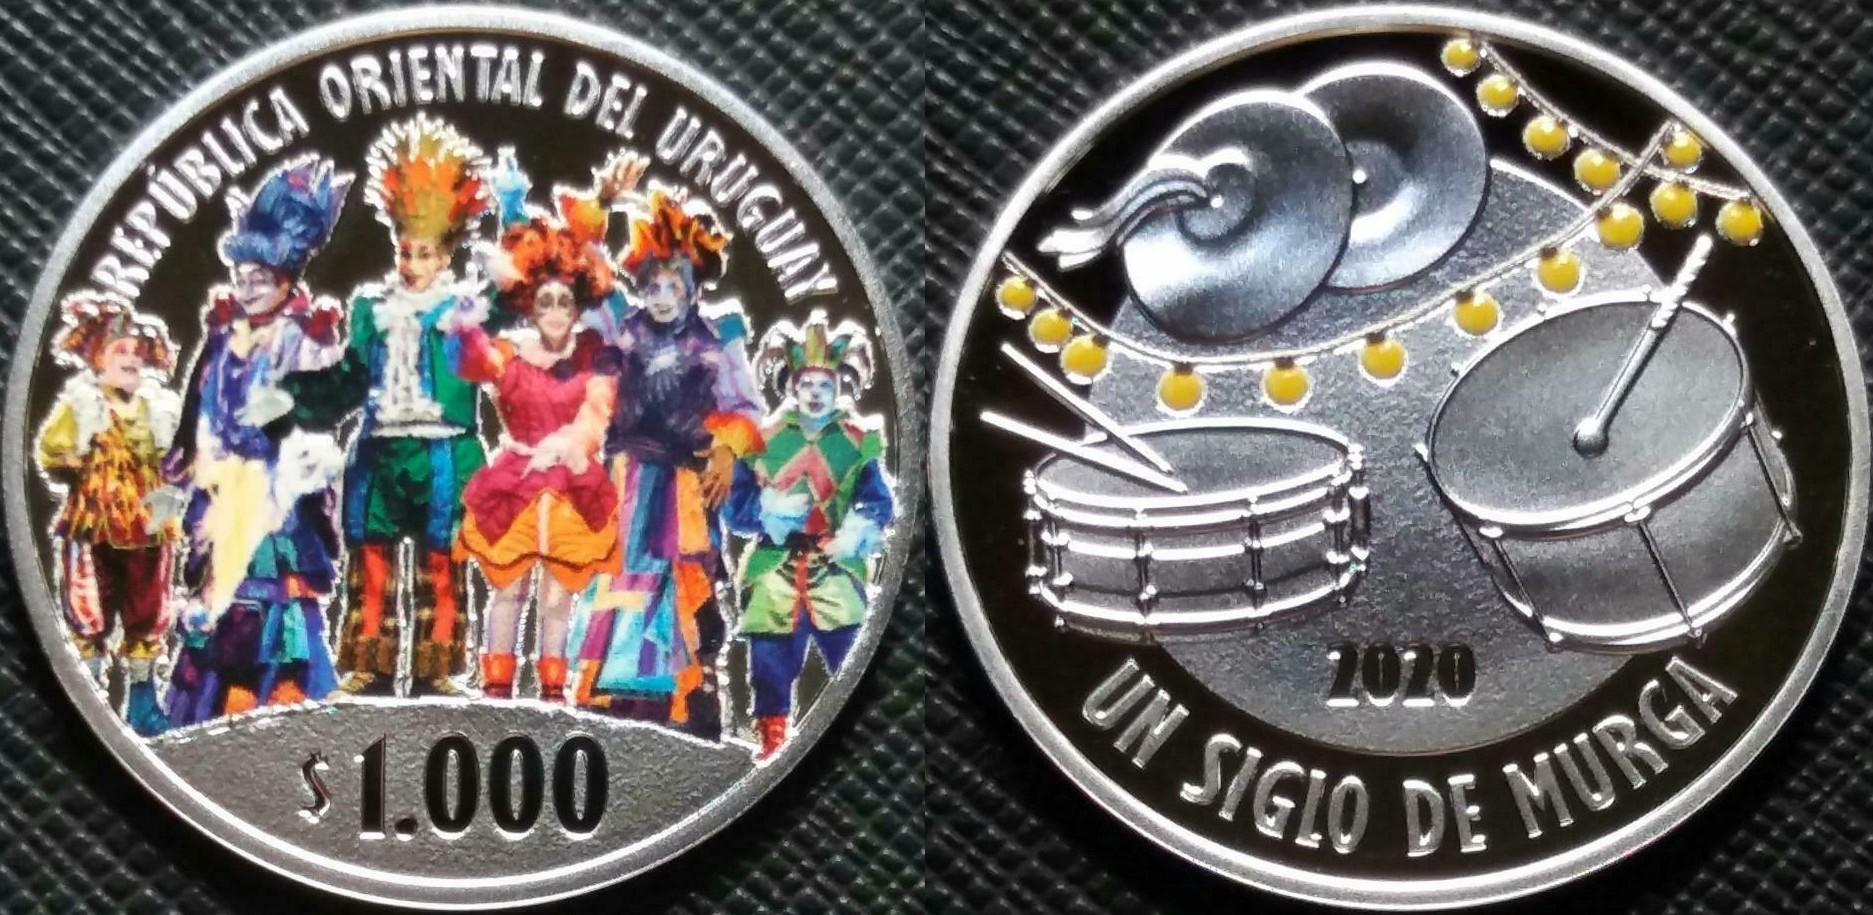 uruguay-2020-centenaire-du-carnaval-la-murga